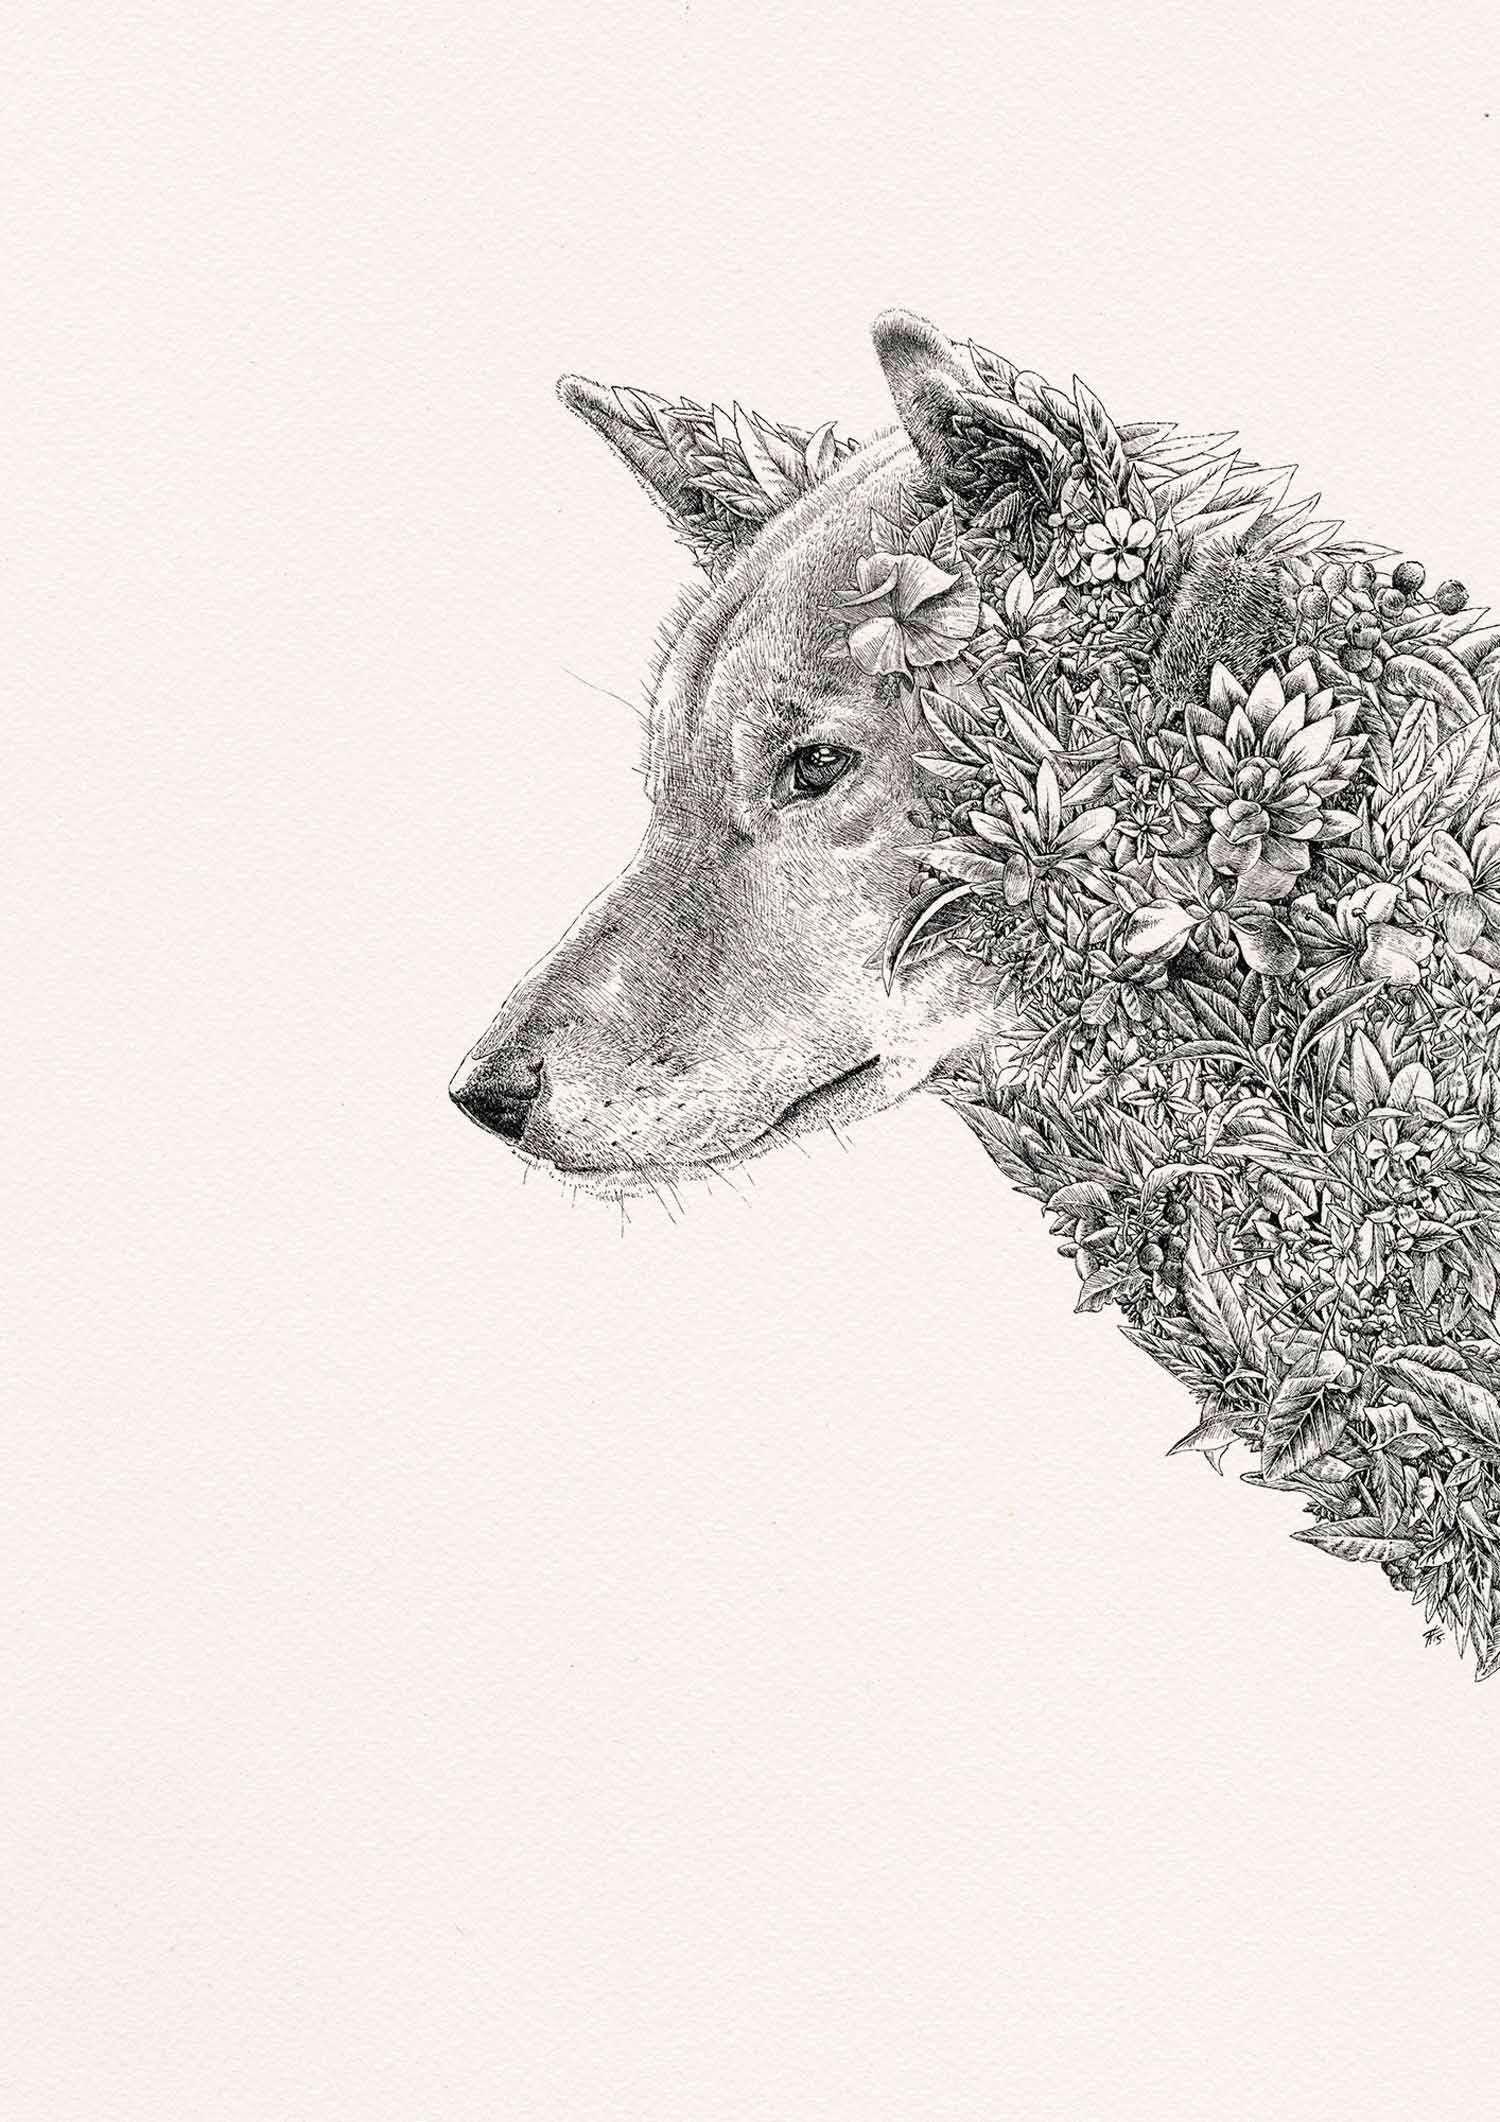 Dingo Illustration by Nathan Ferlazzo